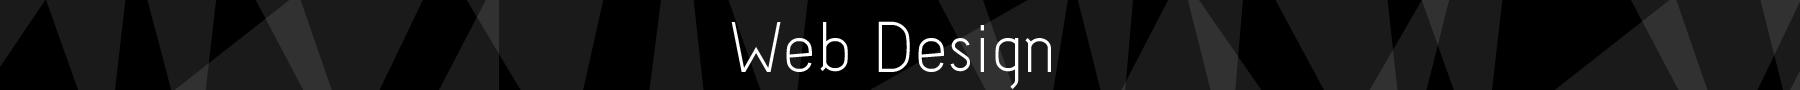 case_study_06_web_design